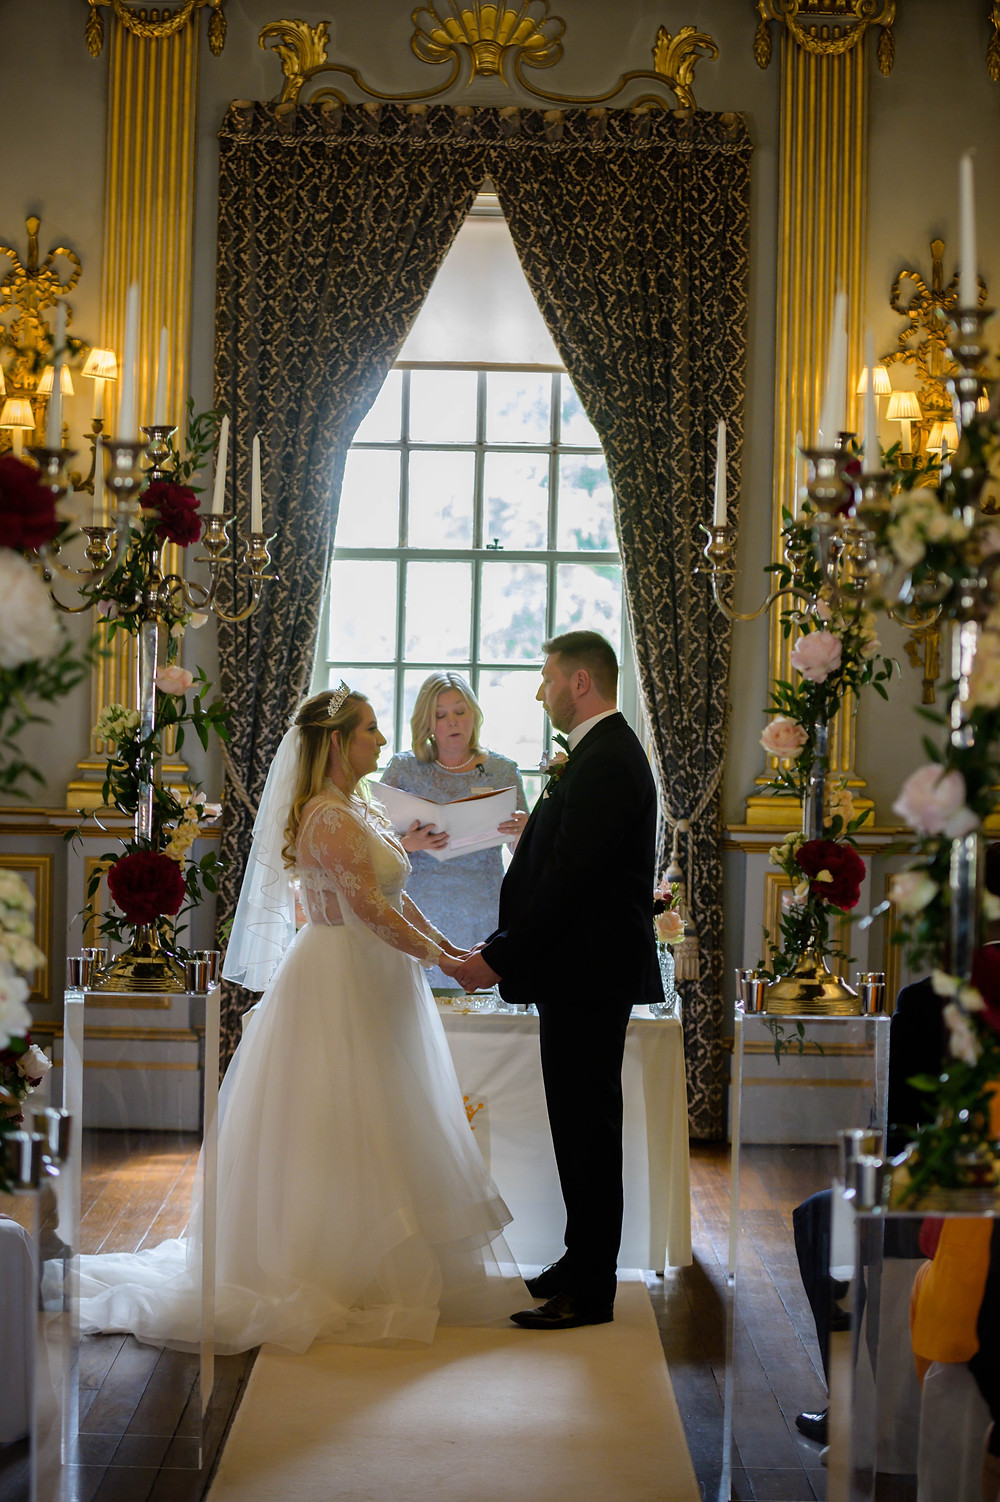 Lorraine Hull, wedding celebrant